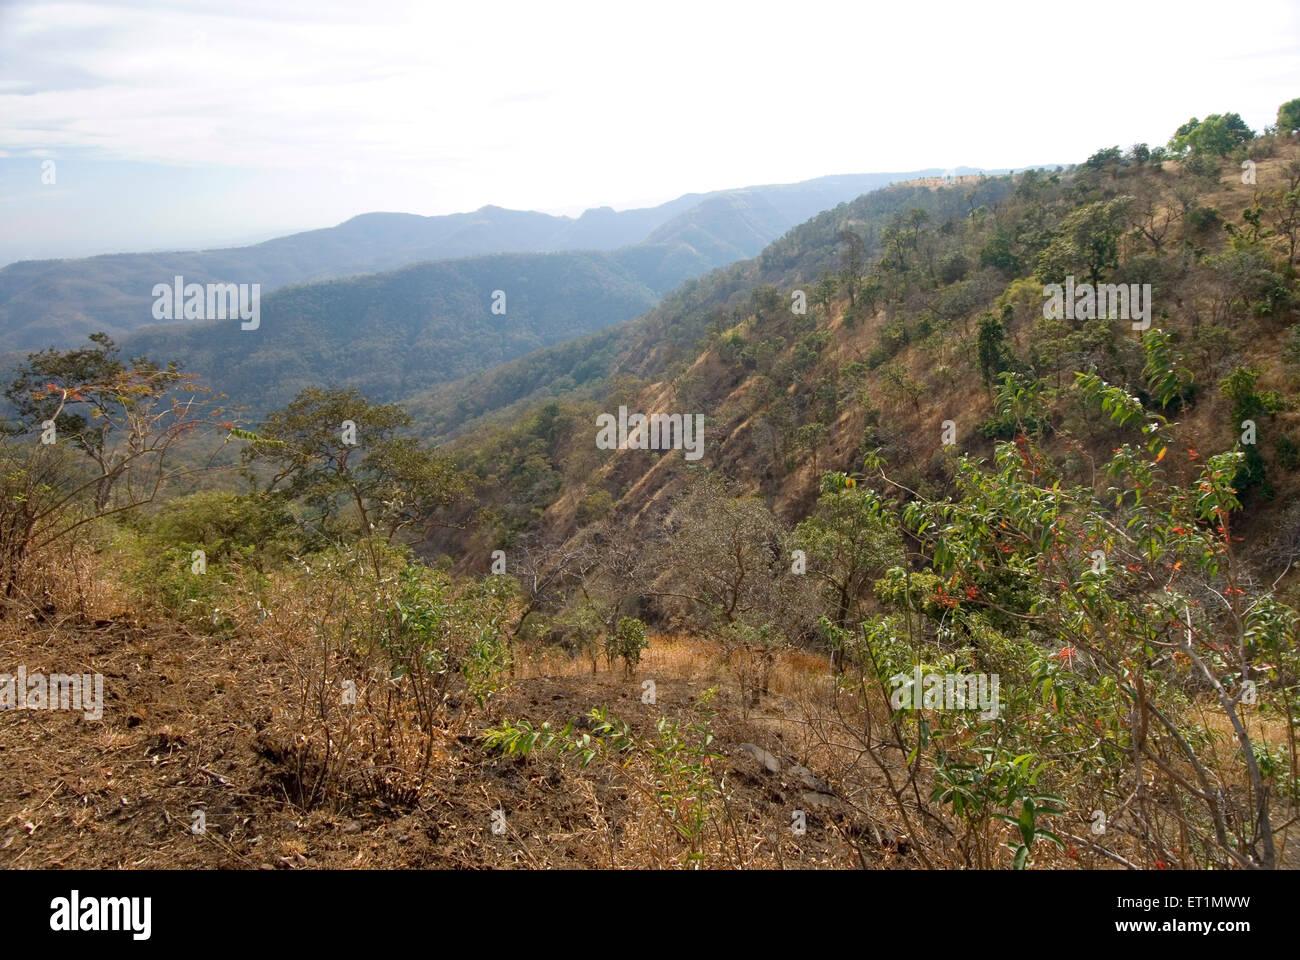 Valleys and mountains of Saputara ranges at Chikhaldara ; district Amravati ; Maharashtra ; India - Stock Image